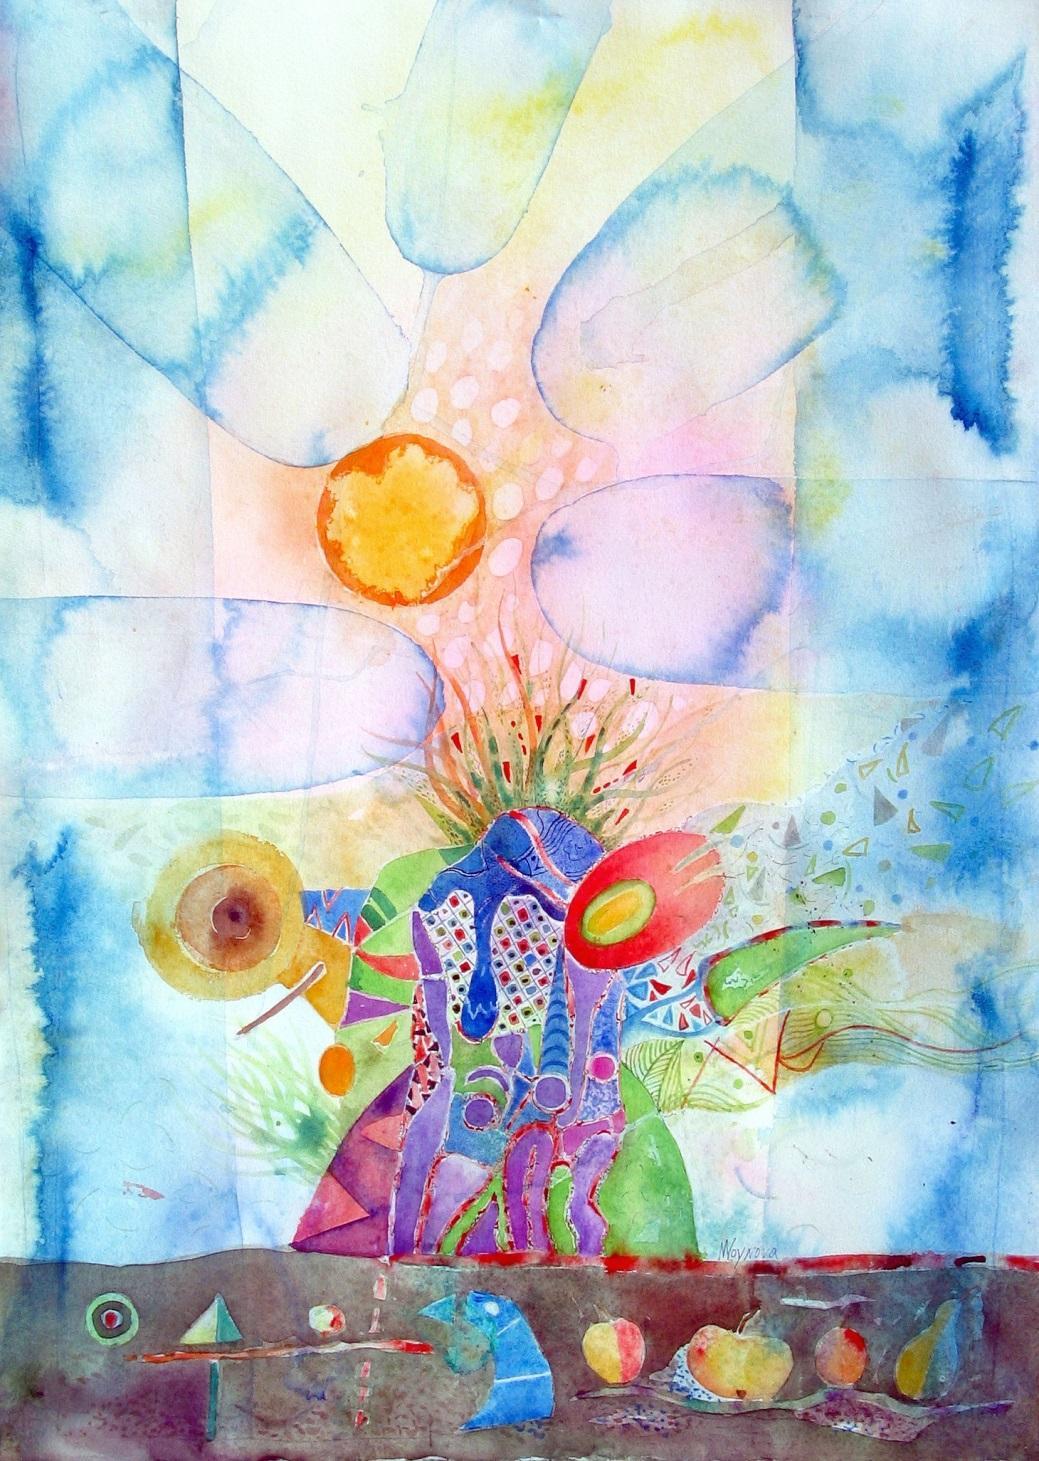 D:\__АртДИАЛОГ 2016, № 2\Марги Войнова - илюстрации\01 Кулата на мечтите-1.JPG